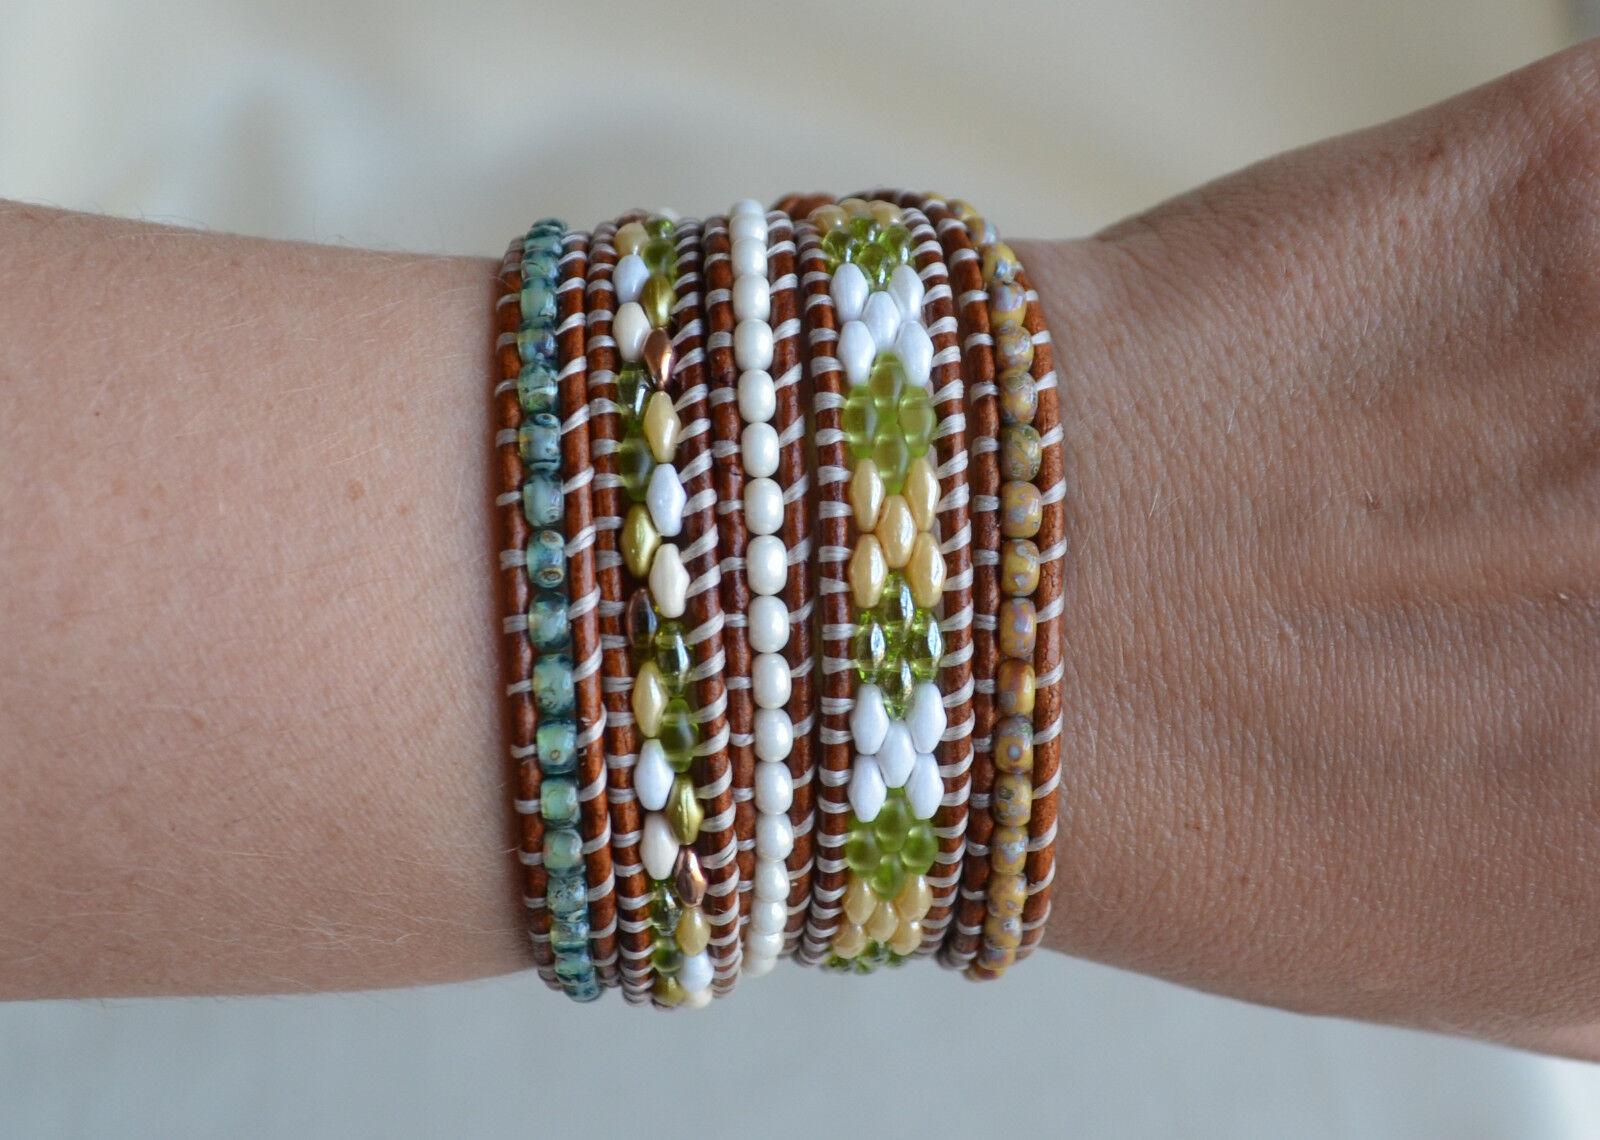 Green Five Wrap Bracelet Handmade Beads On Leather Beaded 35.25-36.25'' By Yevga